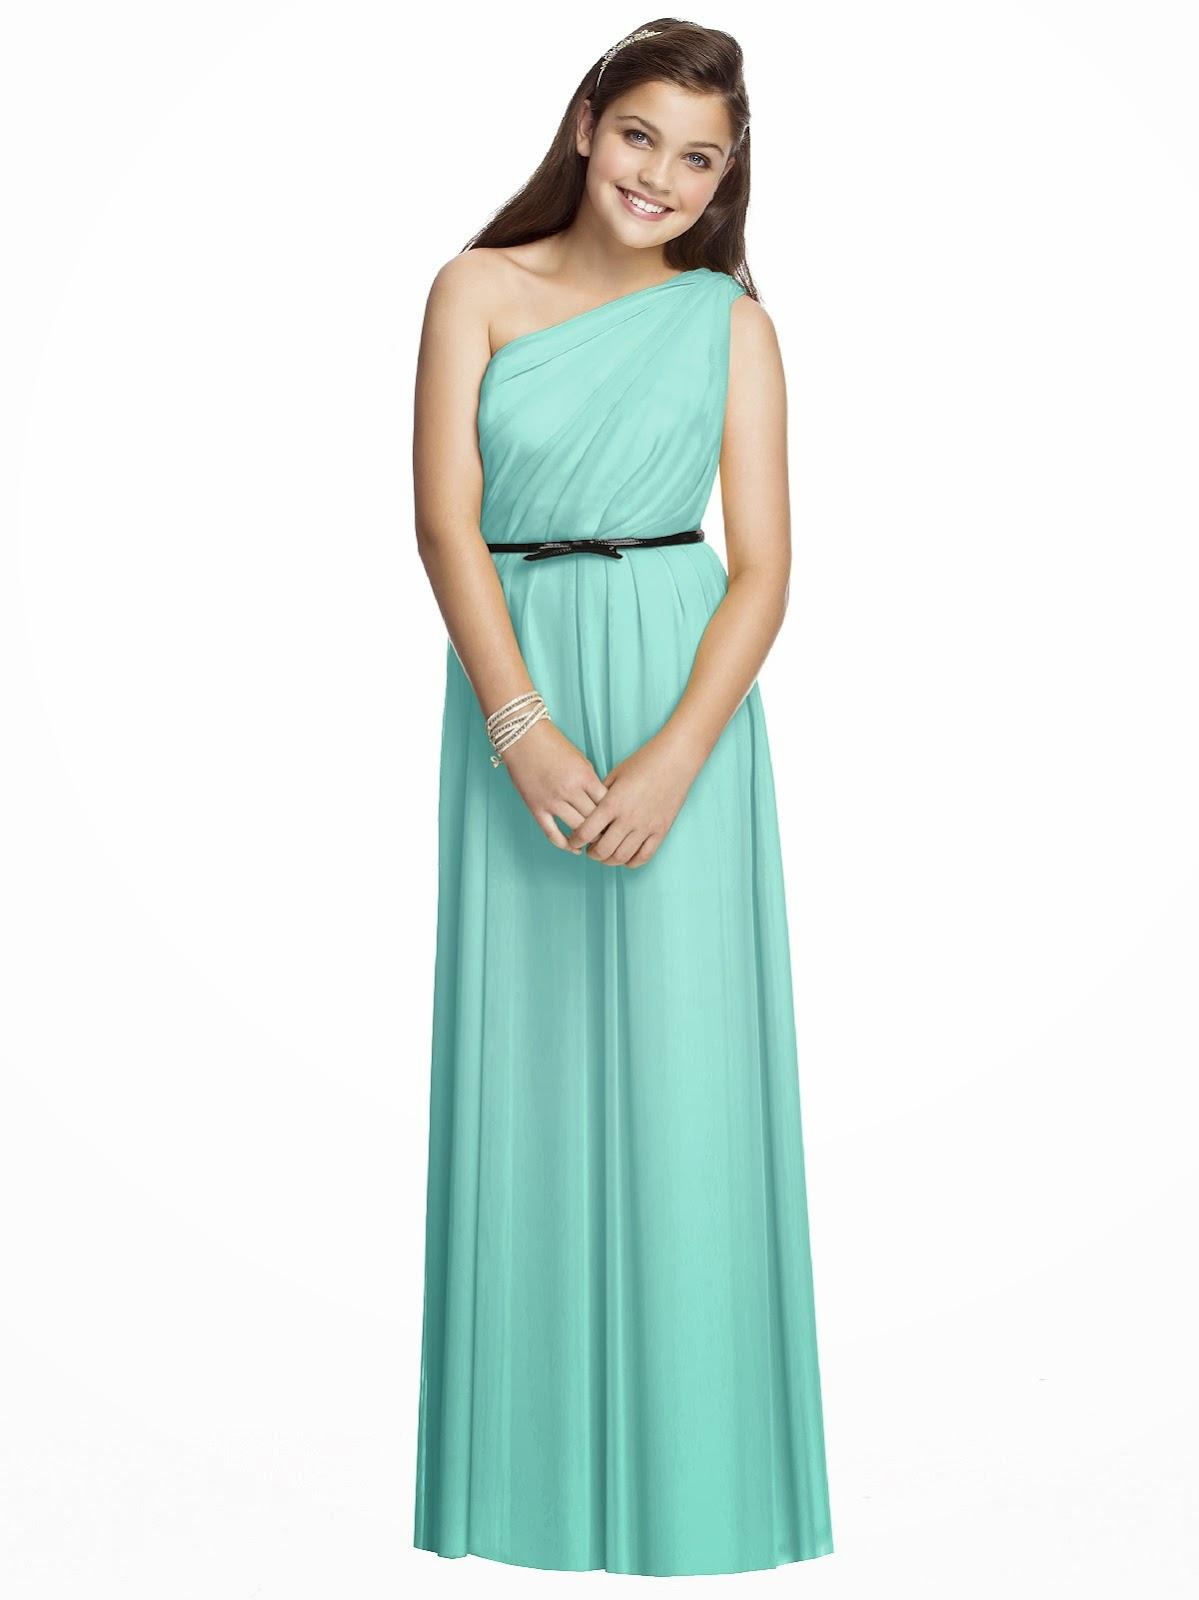 Macys Junior Bridesmaid Dresses